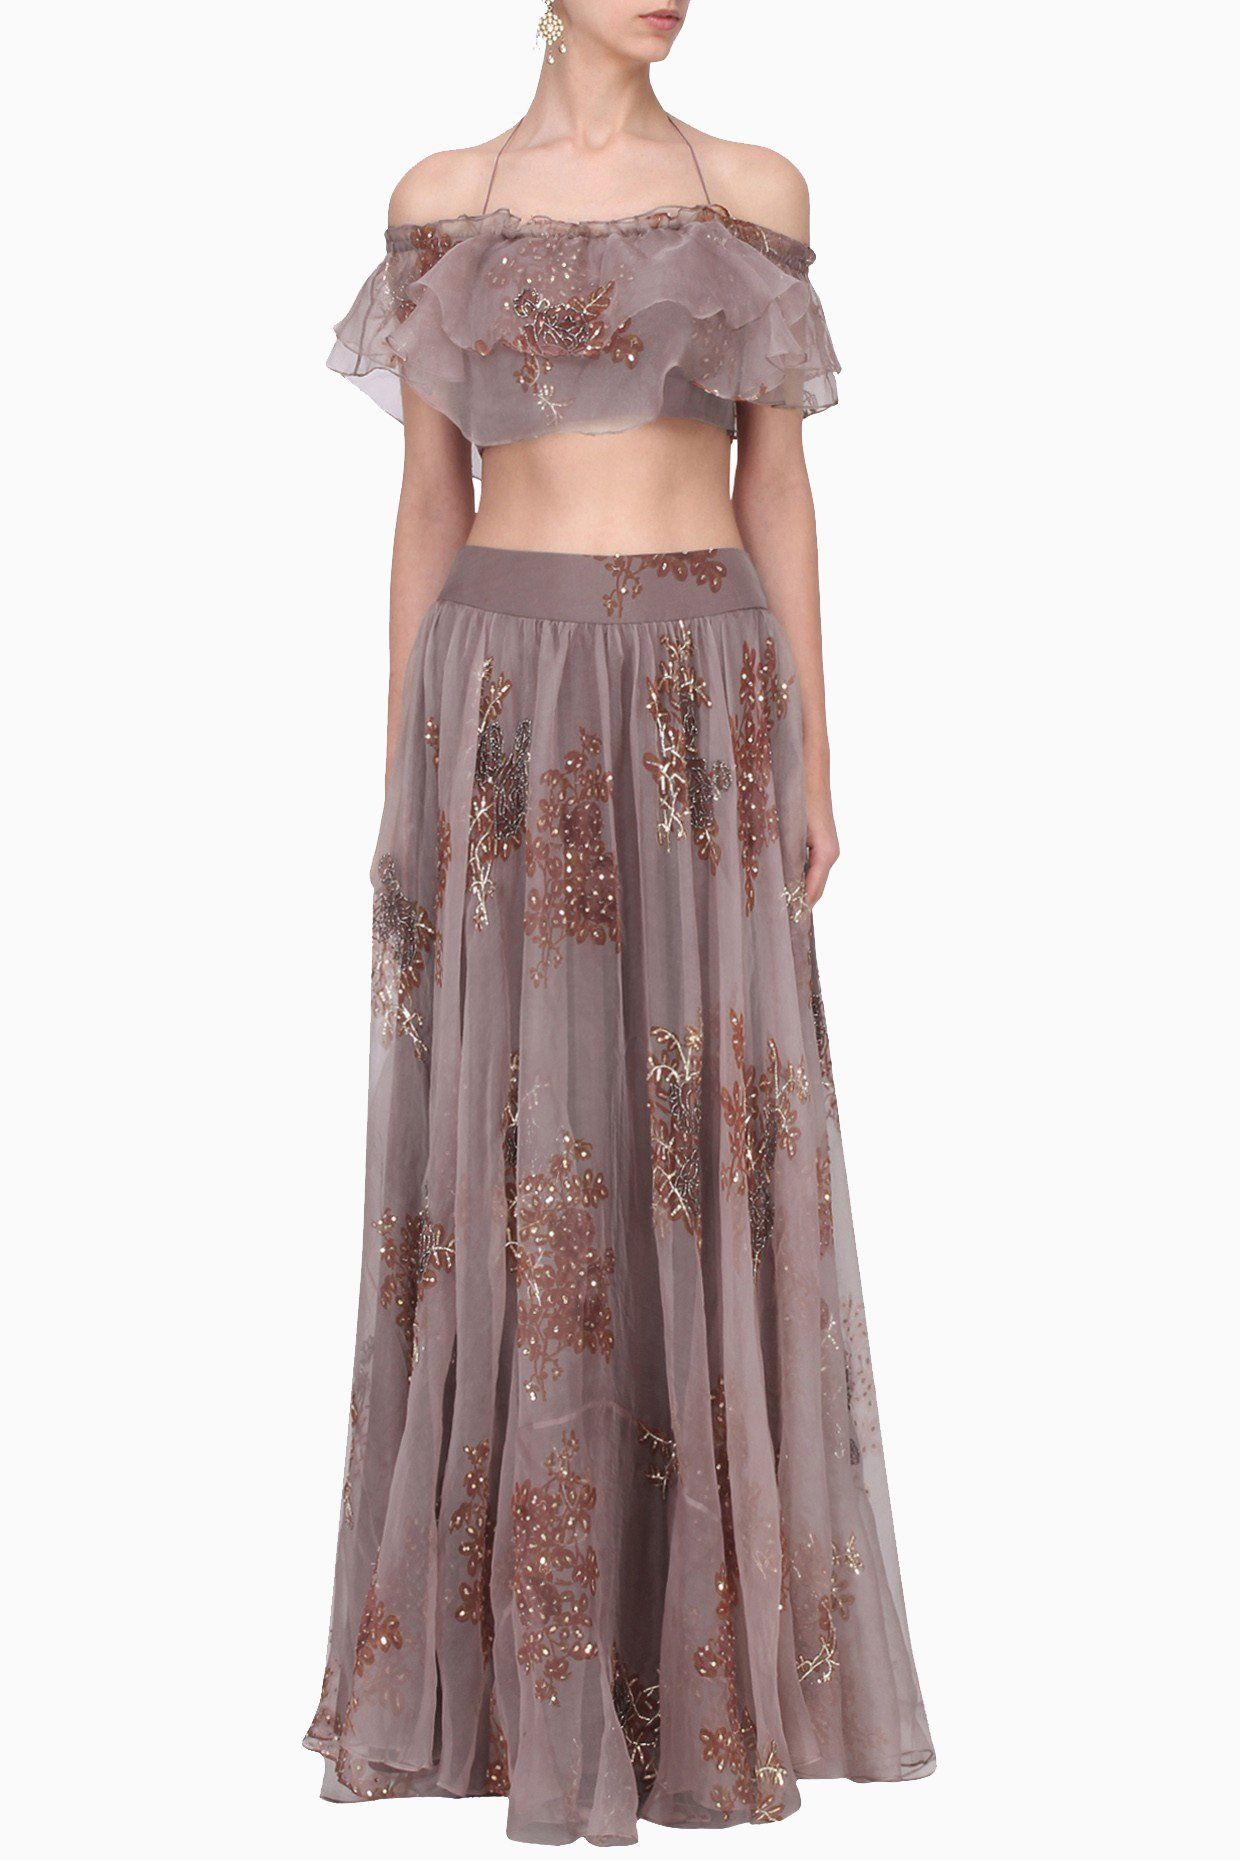 Best dresses to wear to a march wedding  Lavender Frill Off Shoulder Skirt Set  ghaghras  Pinterest